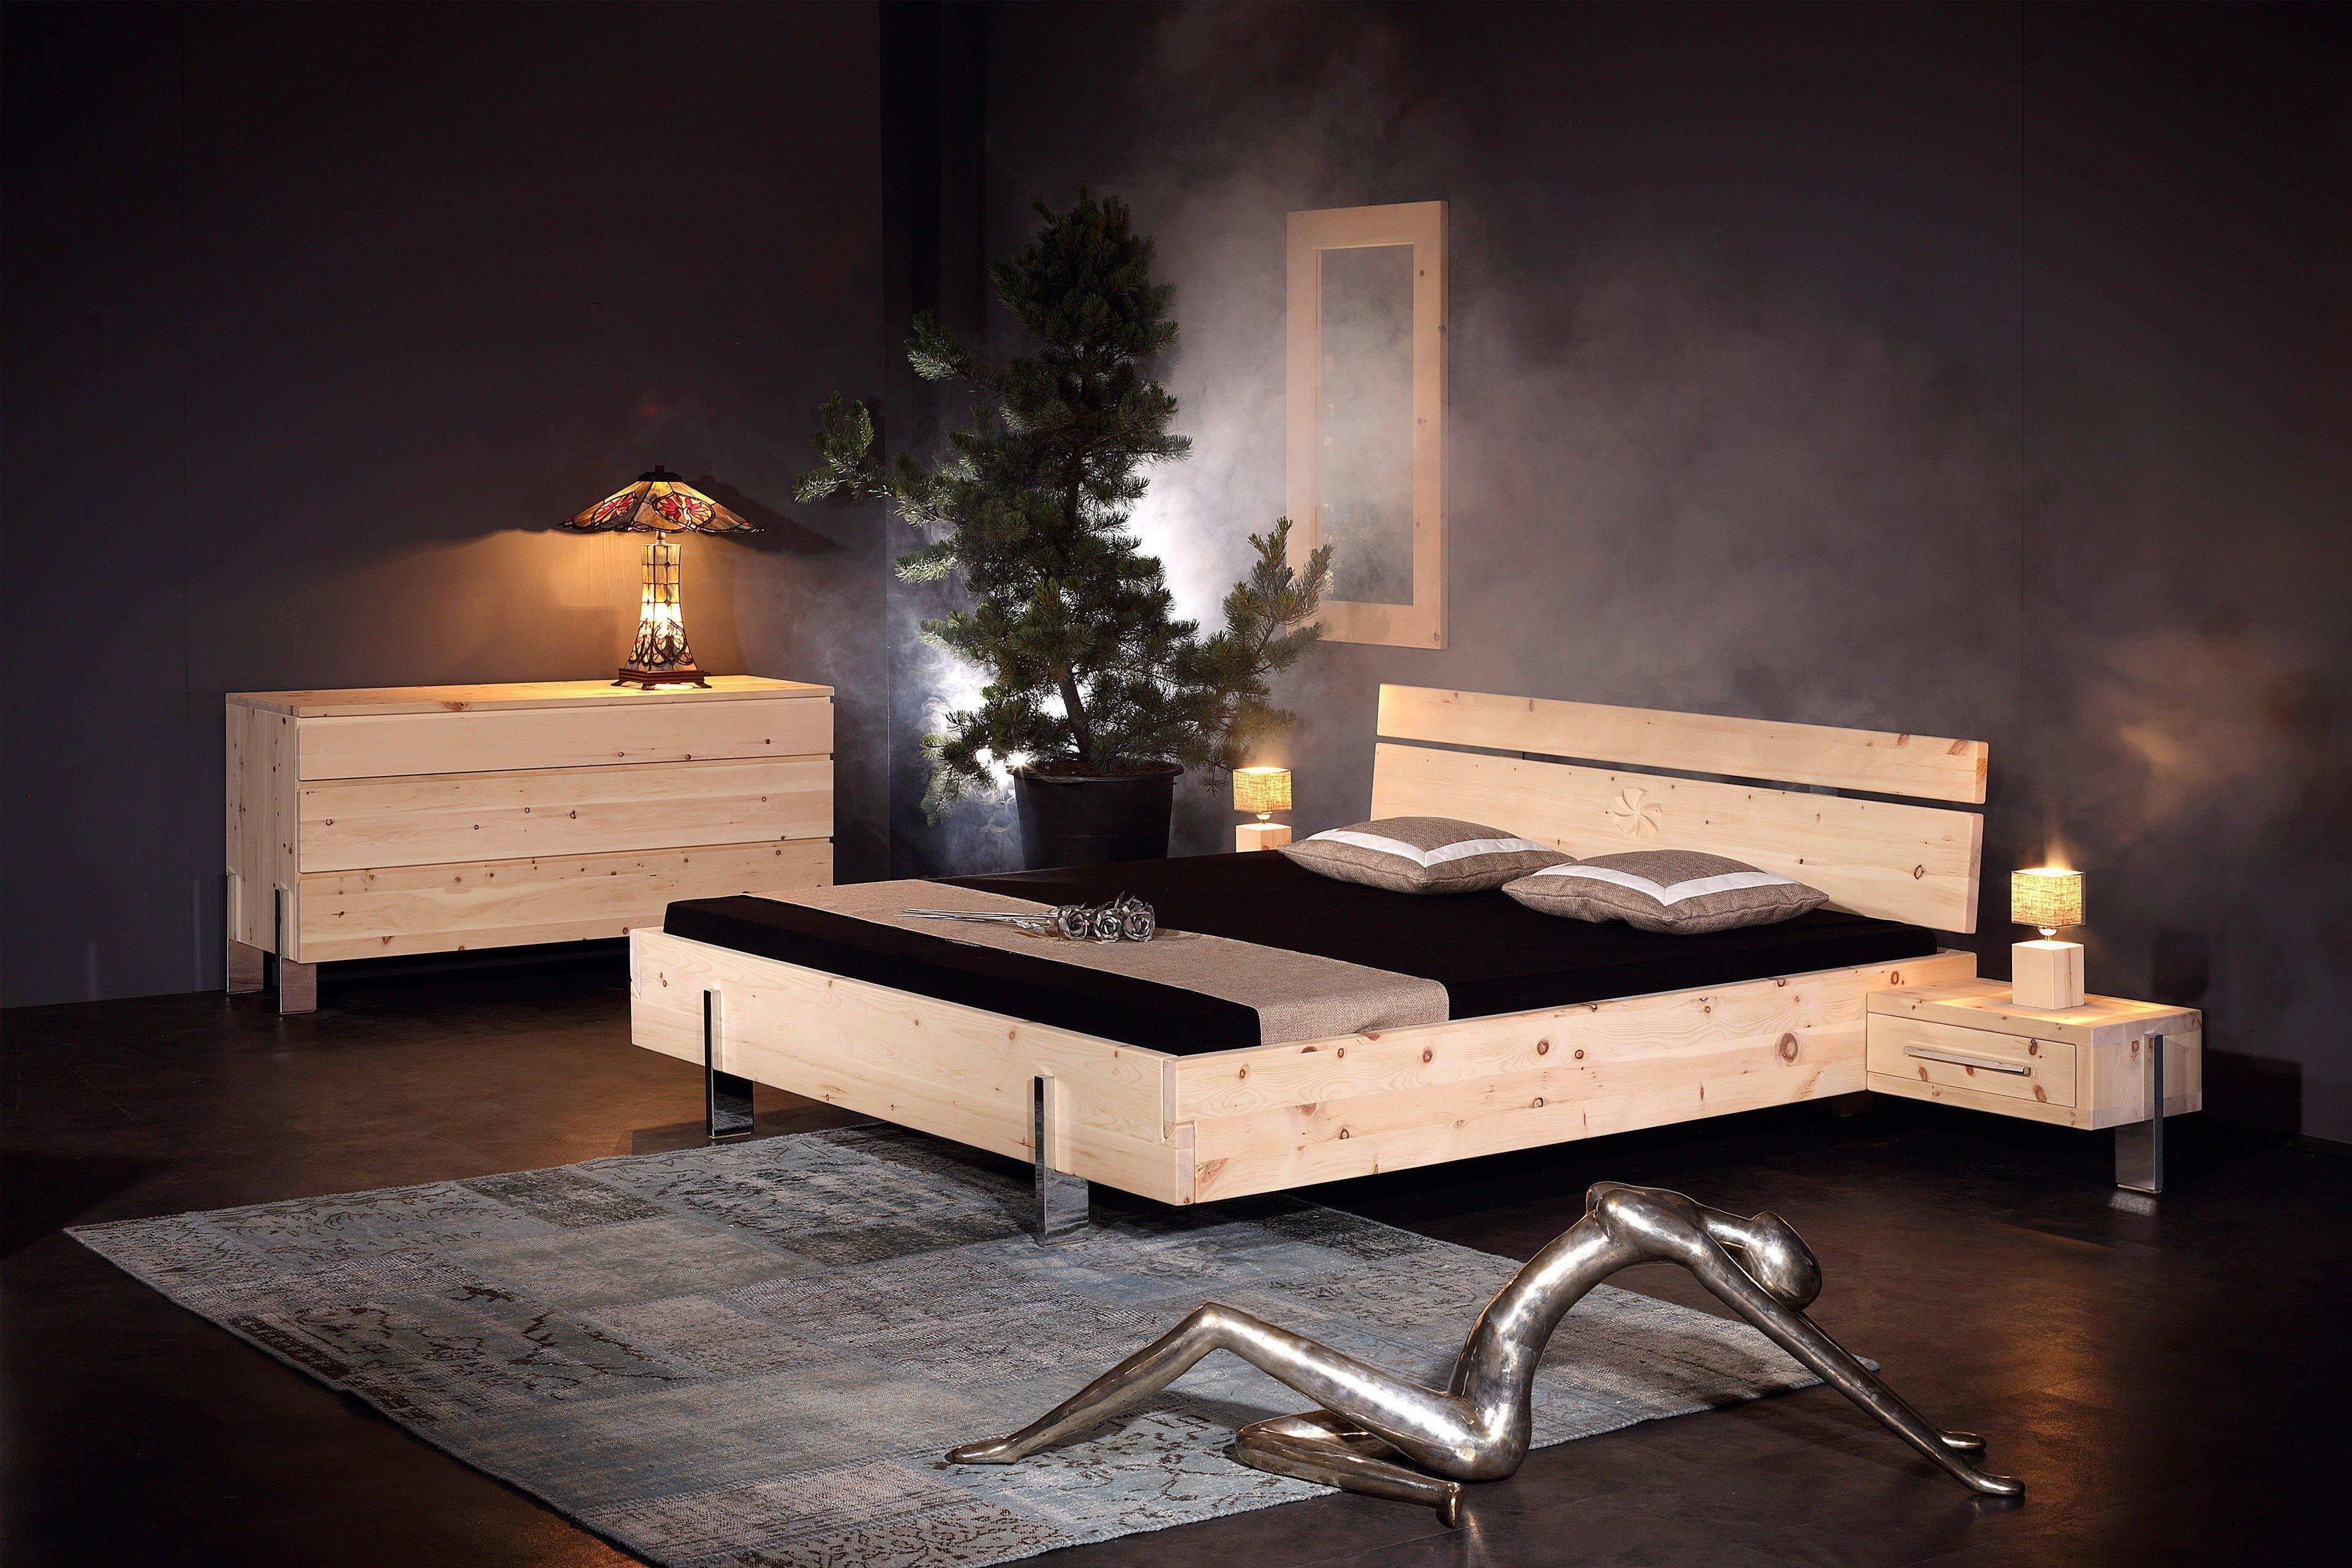 sprenger parpan bett zirbe massivholz m bel letz ihr online shop. Black Bedroom Furniture Sets. Home Design Ideas